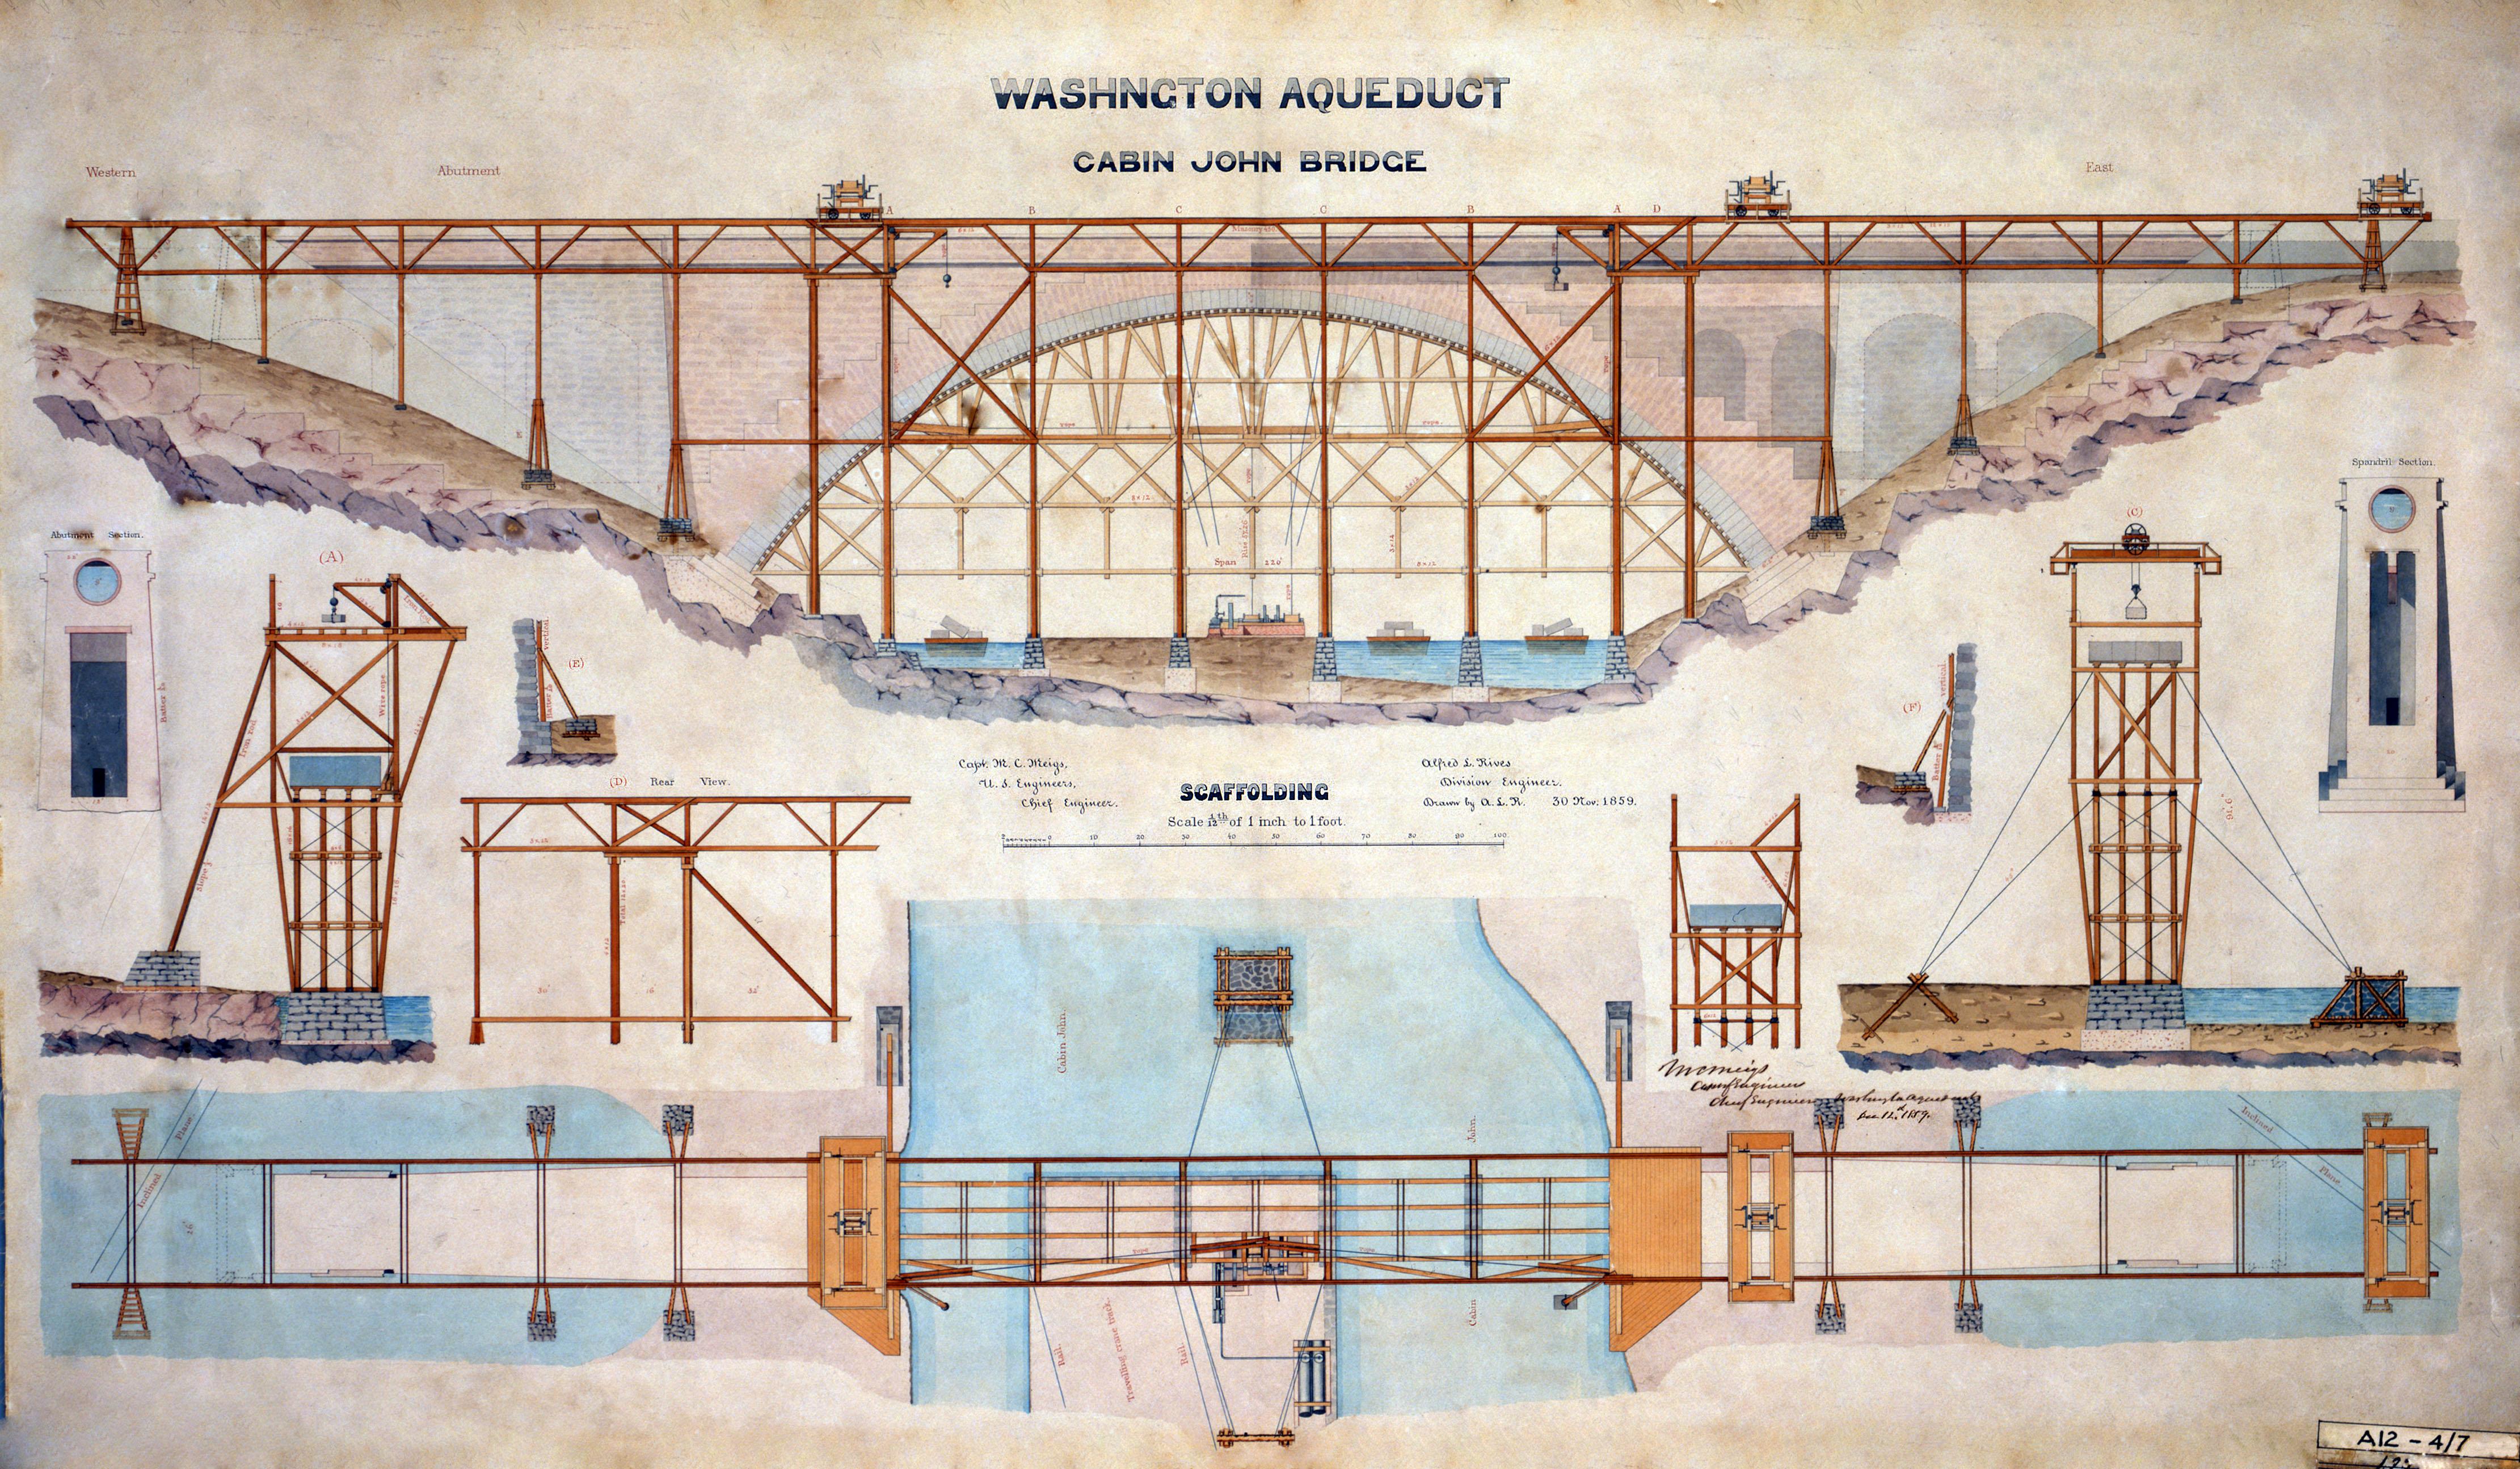 File:Cabin John Bridge MD aka Union Arch drawing 1859.jpg ...